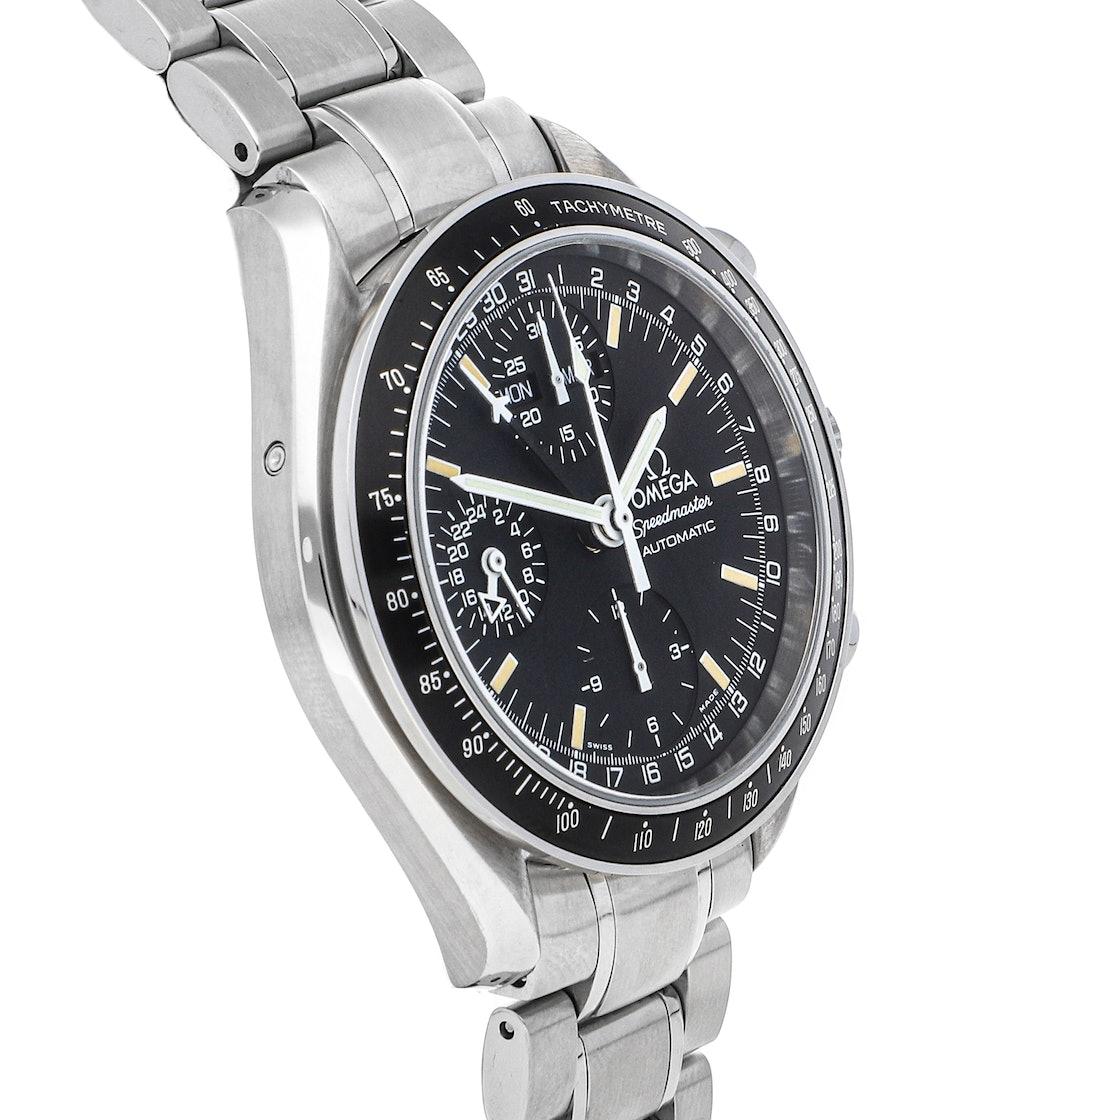 Omega Speedmaster Day-Date Chronograph 3520.50.00